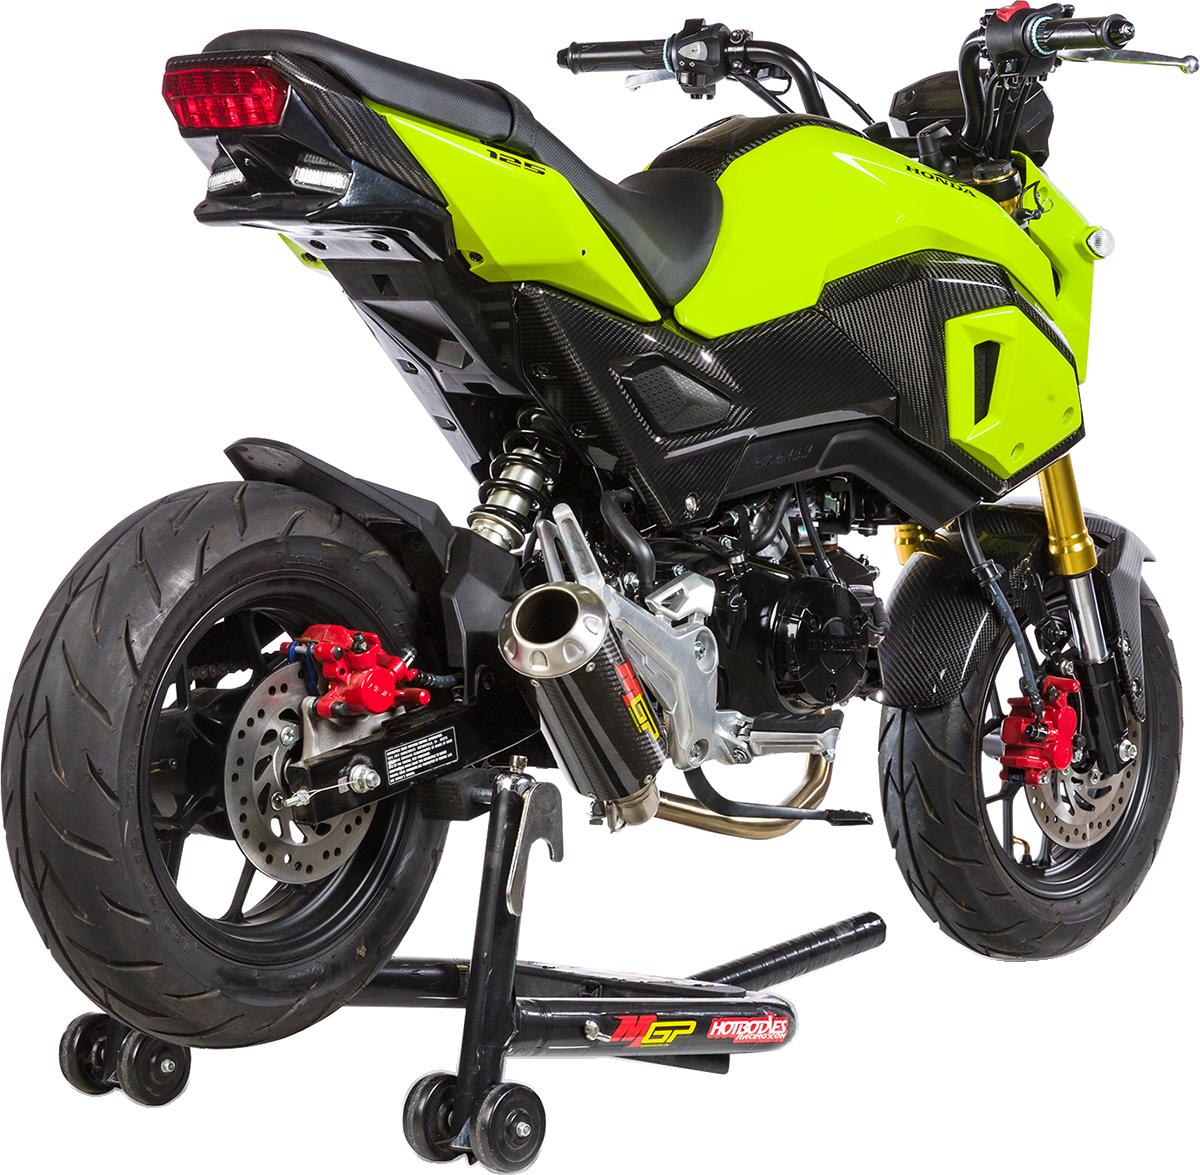 Hot Bodies MGP Carbon Fiber Exhaust System for 17-19 Honda MSX125 Grom